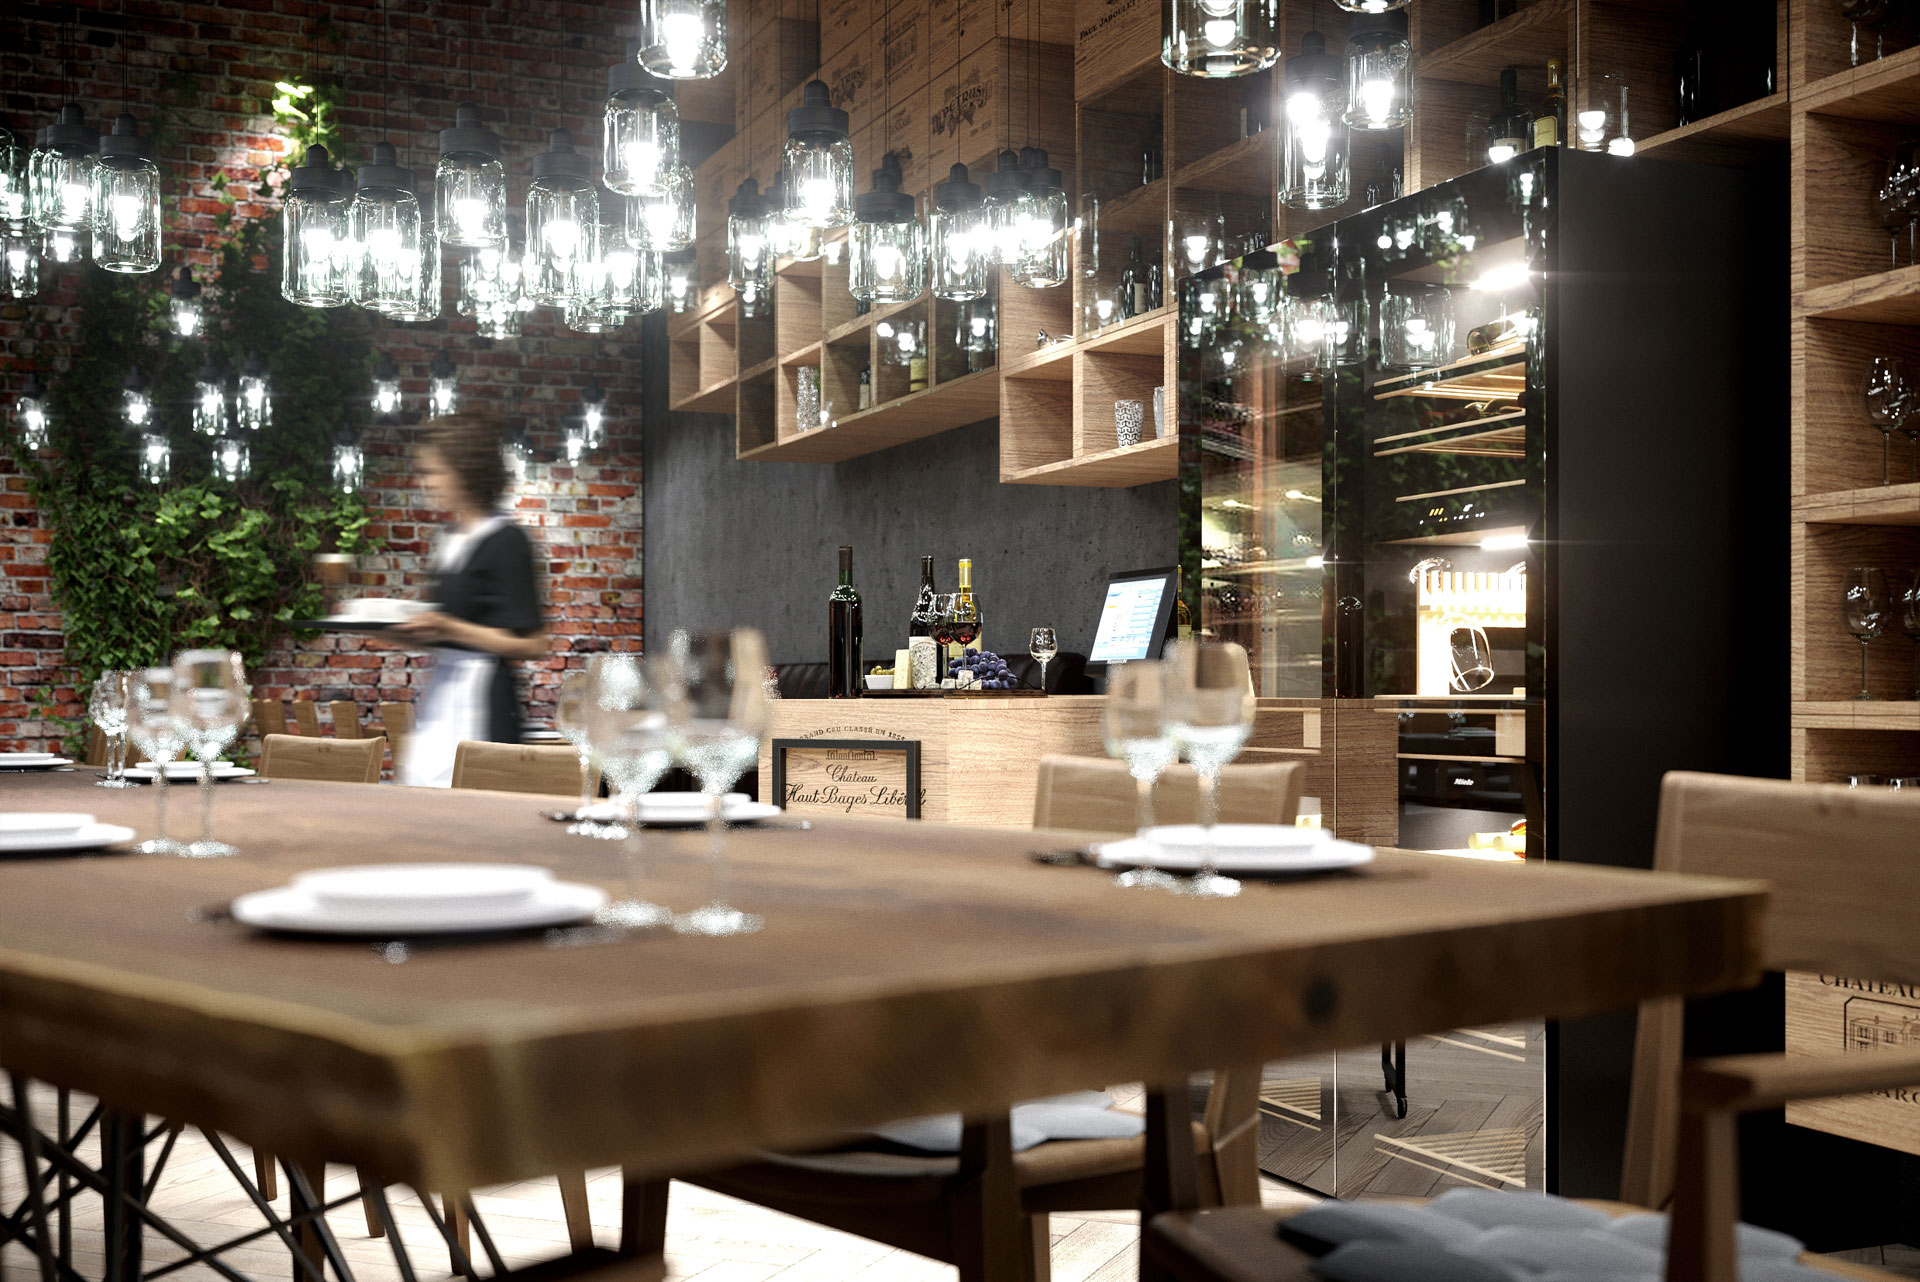 Restauracja cucina aperta galeria serenada krak w pjg for Cucina aperta